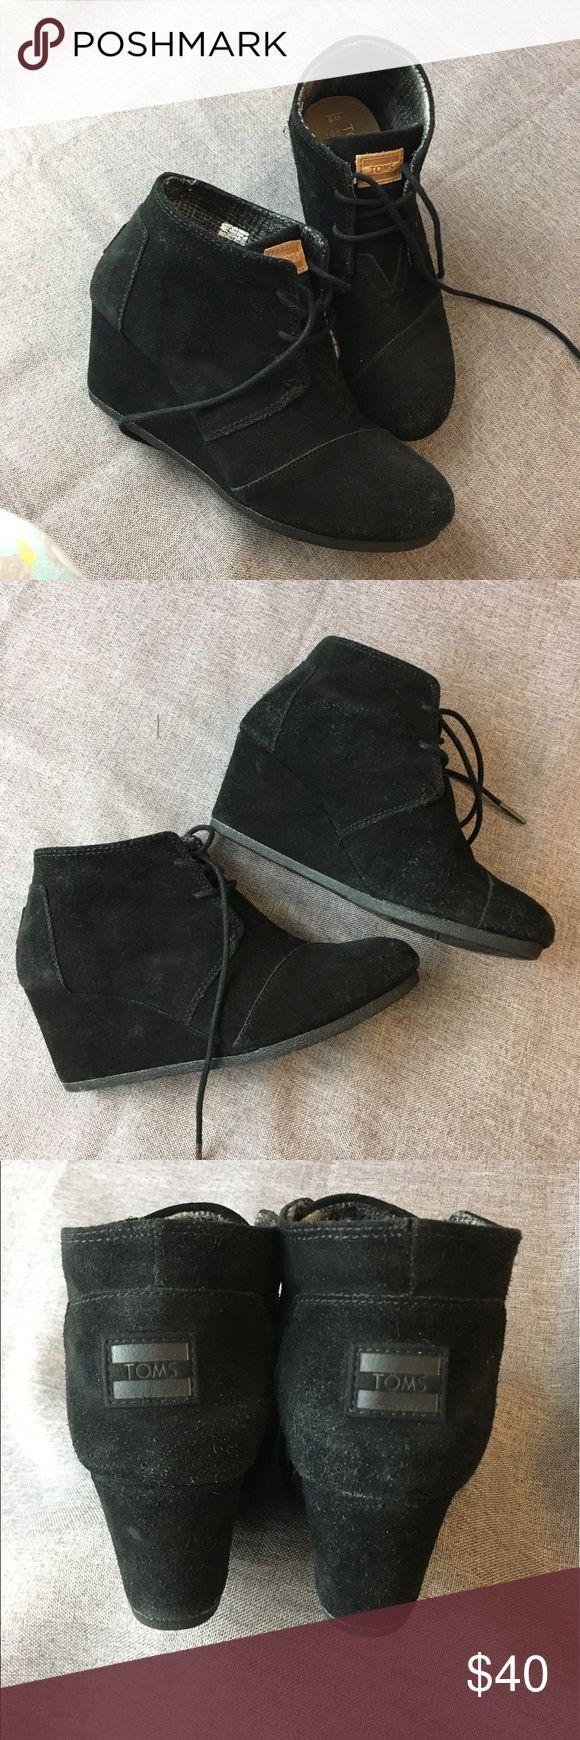 TOMS Black Suede Desert Wedge Boots Sz 8 M TOMS Black Suede Desert Wedges Sz 8 M. TOMS Shoes Wedges